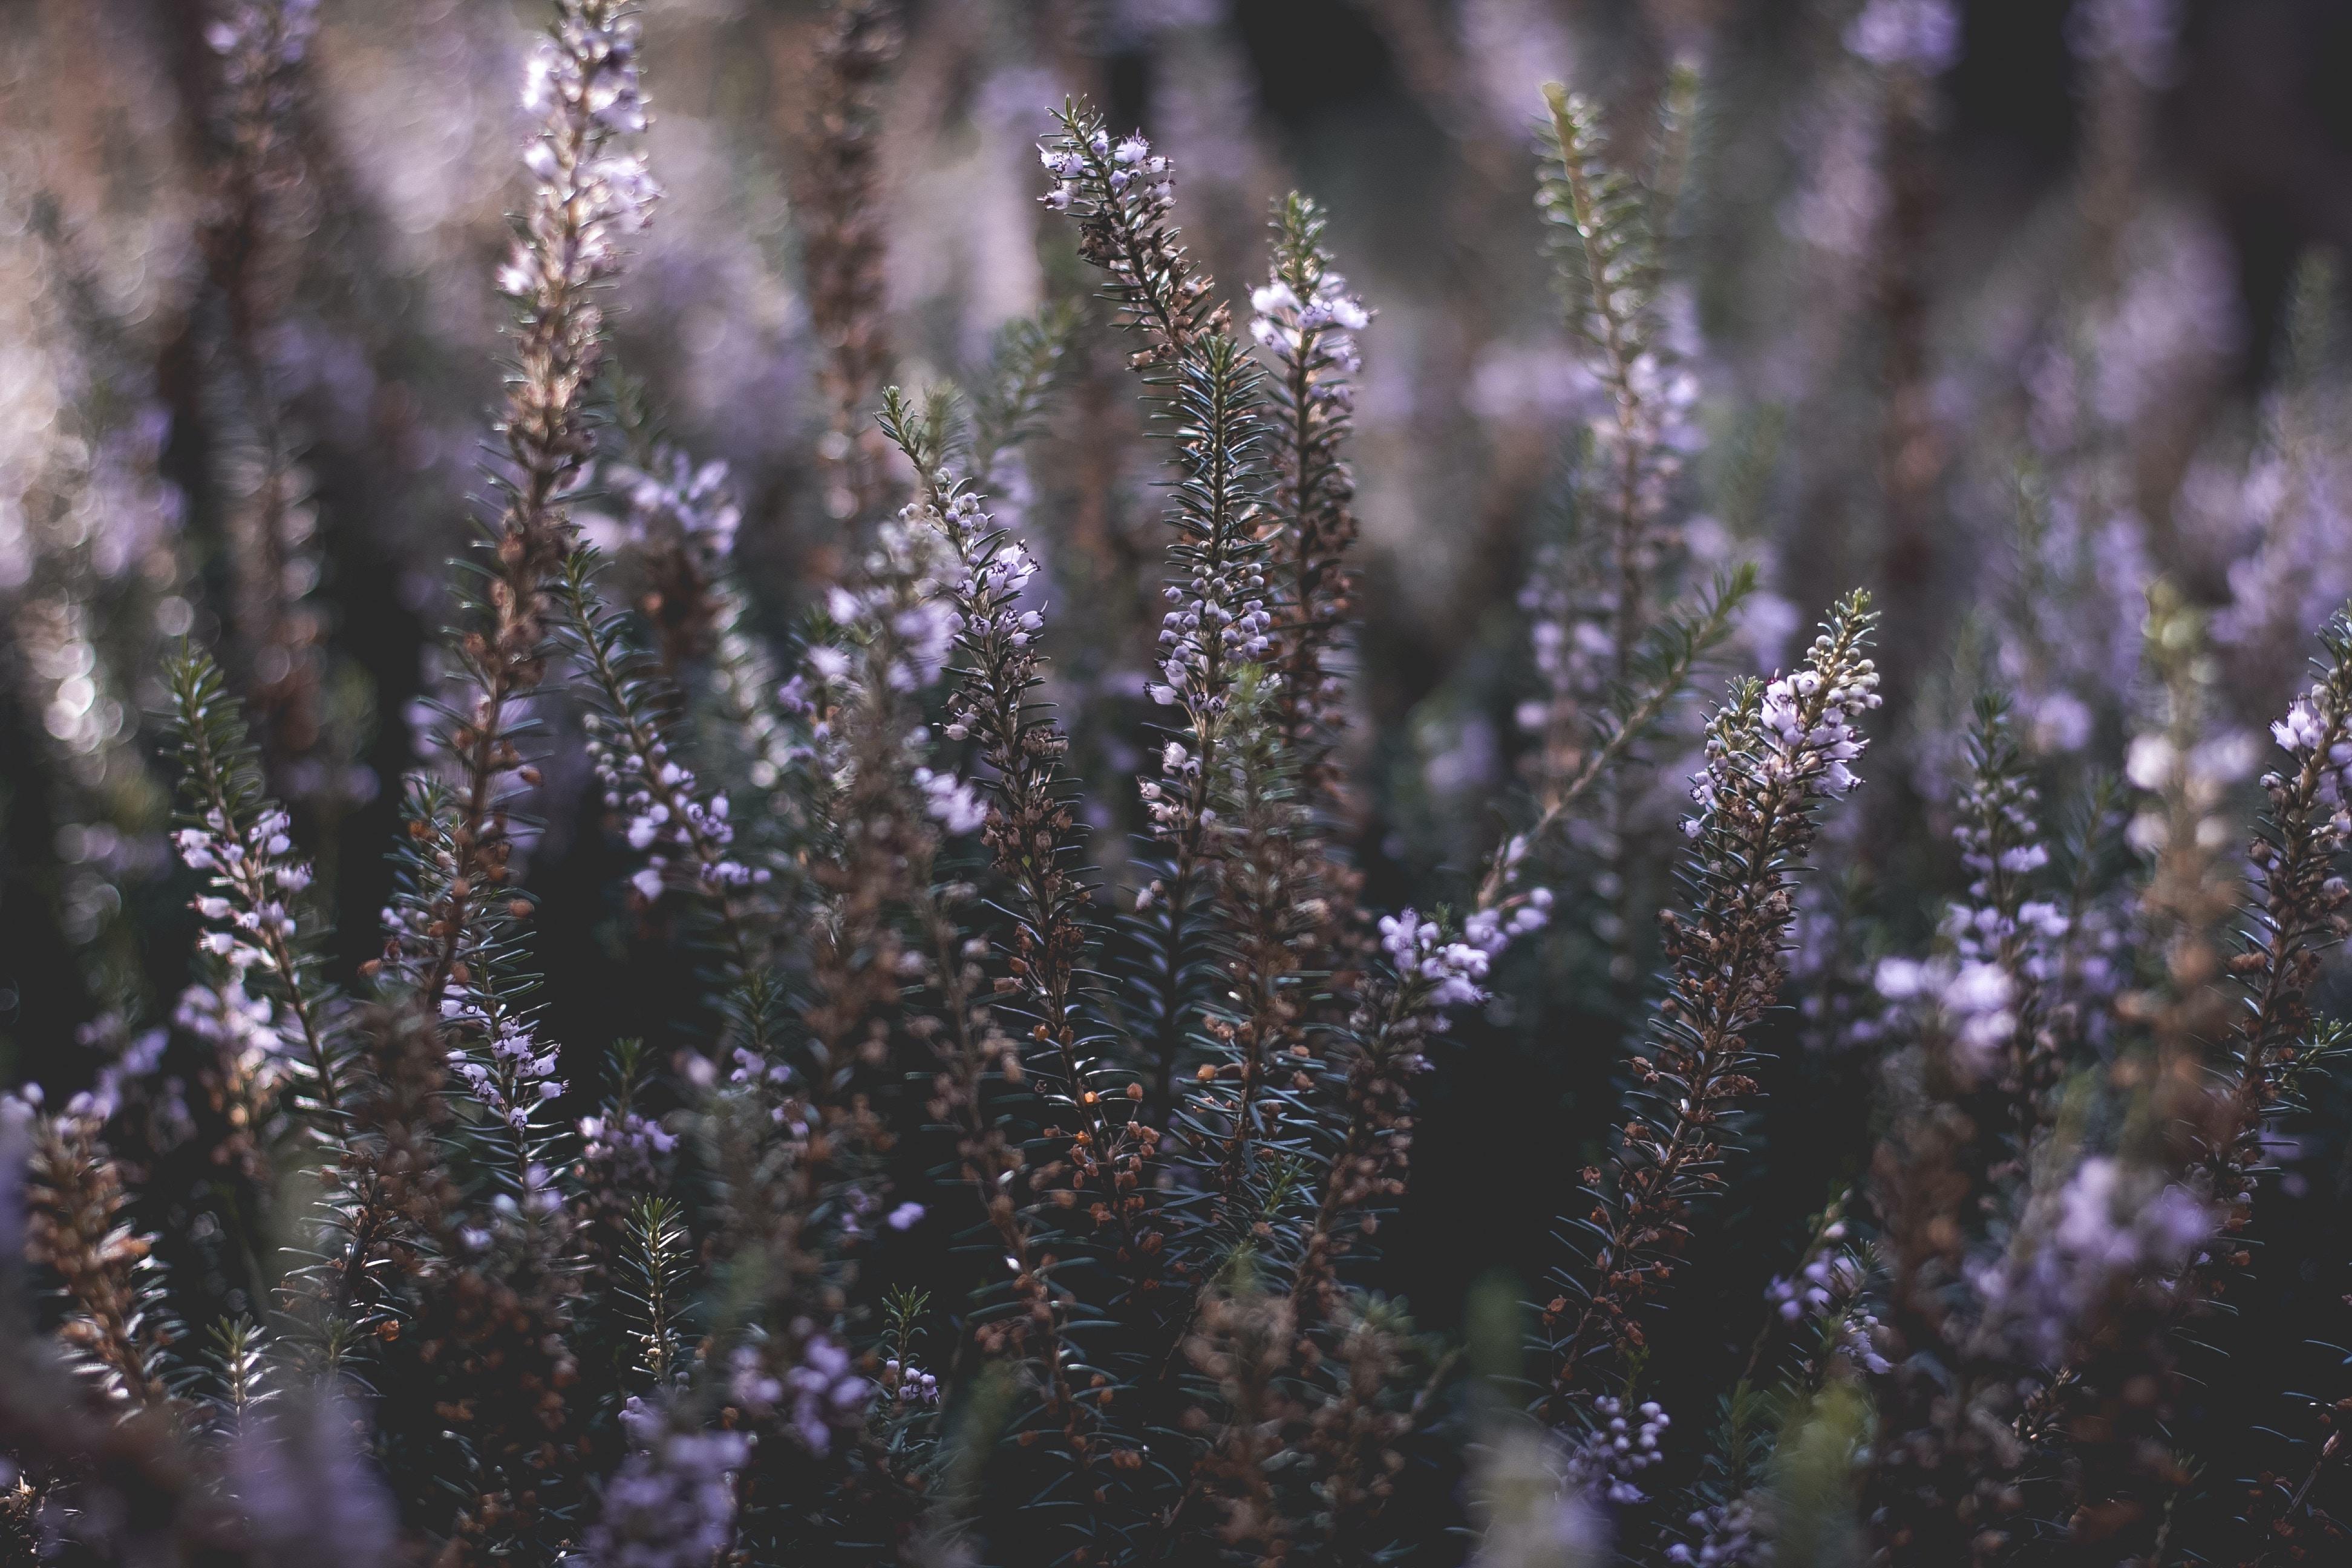 purple petaled flowers during daytime